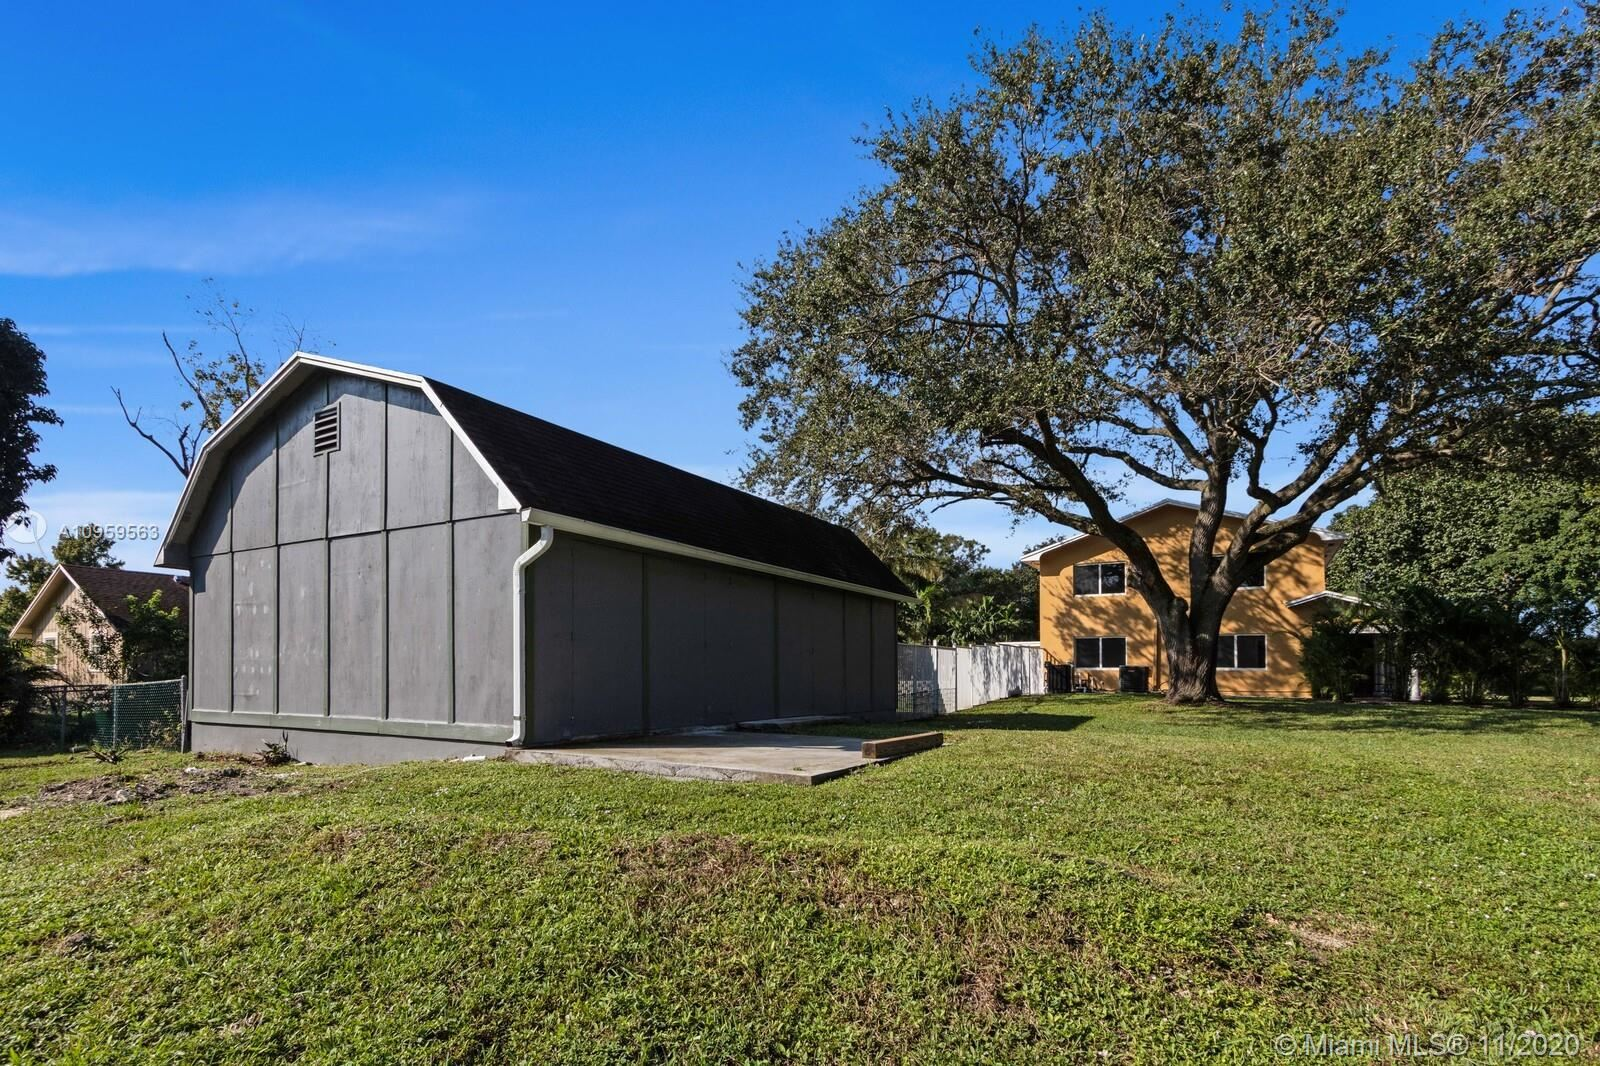 Photo of 11500 NW 21st St, Plantation, FL 33323 (MLS # A10959563)